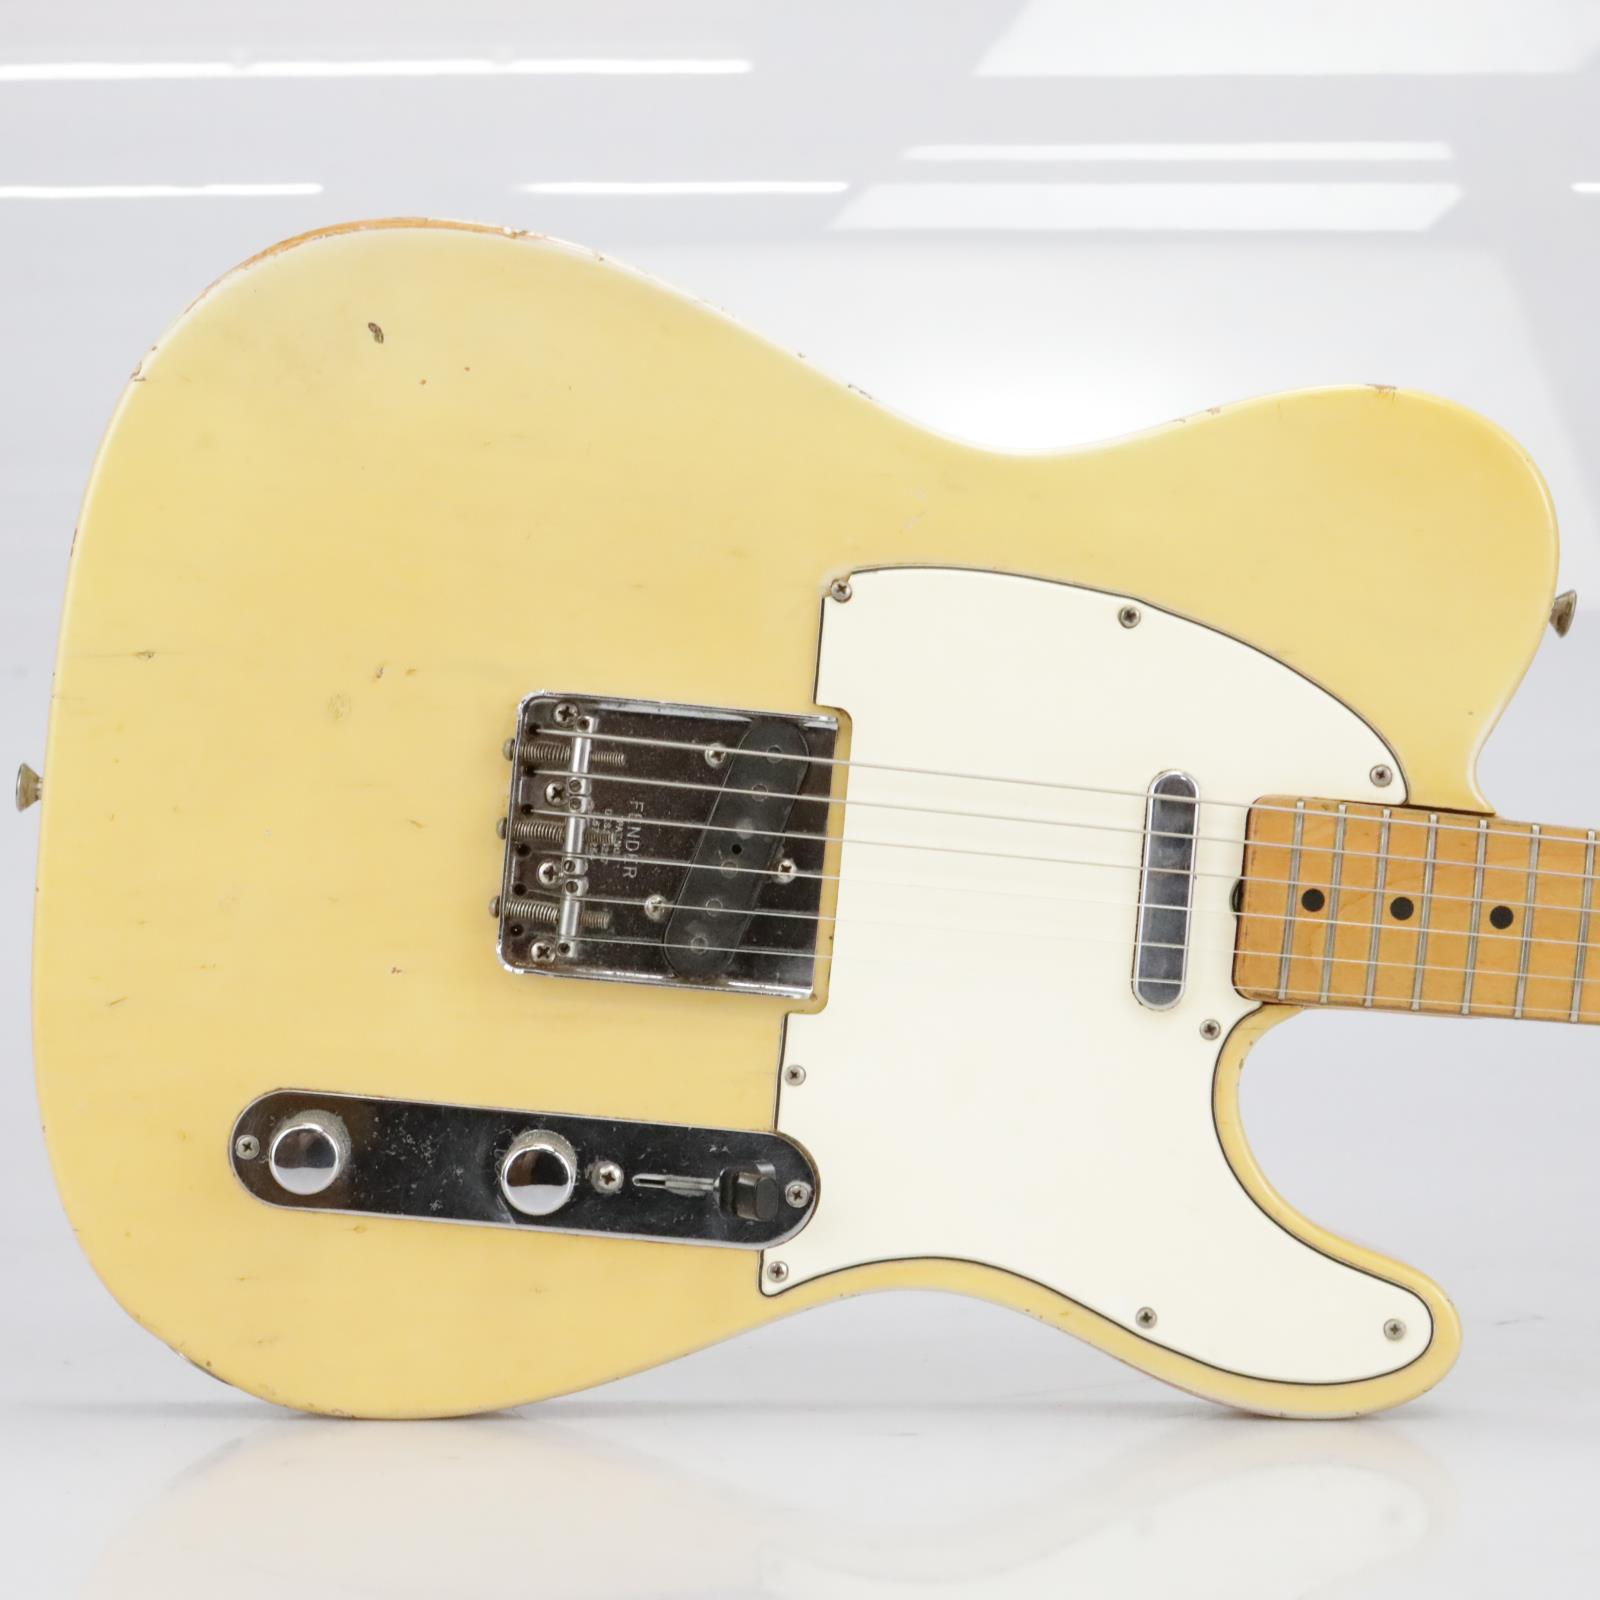 1968 Fender Telecaster Tele Blonde w/ Hard Case 100% Original #40153